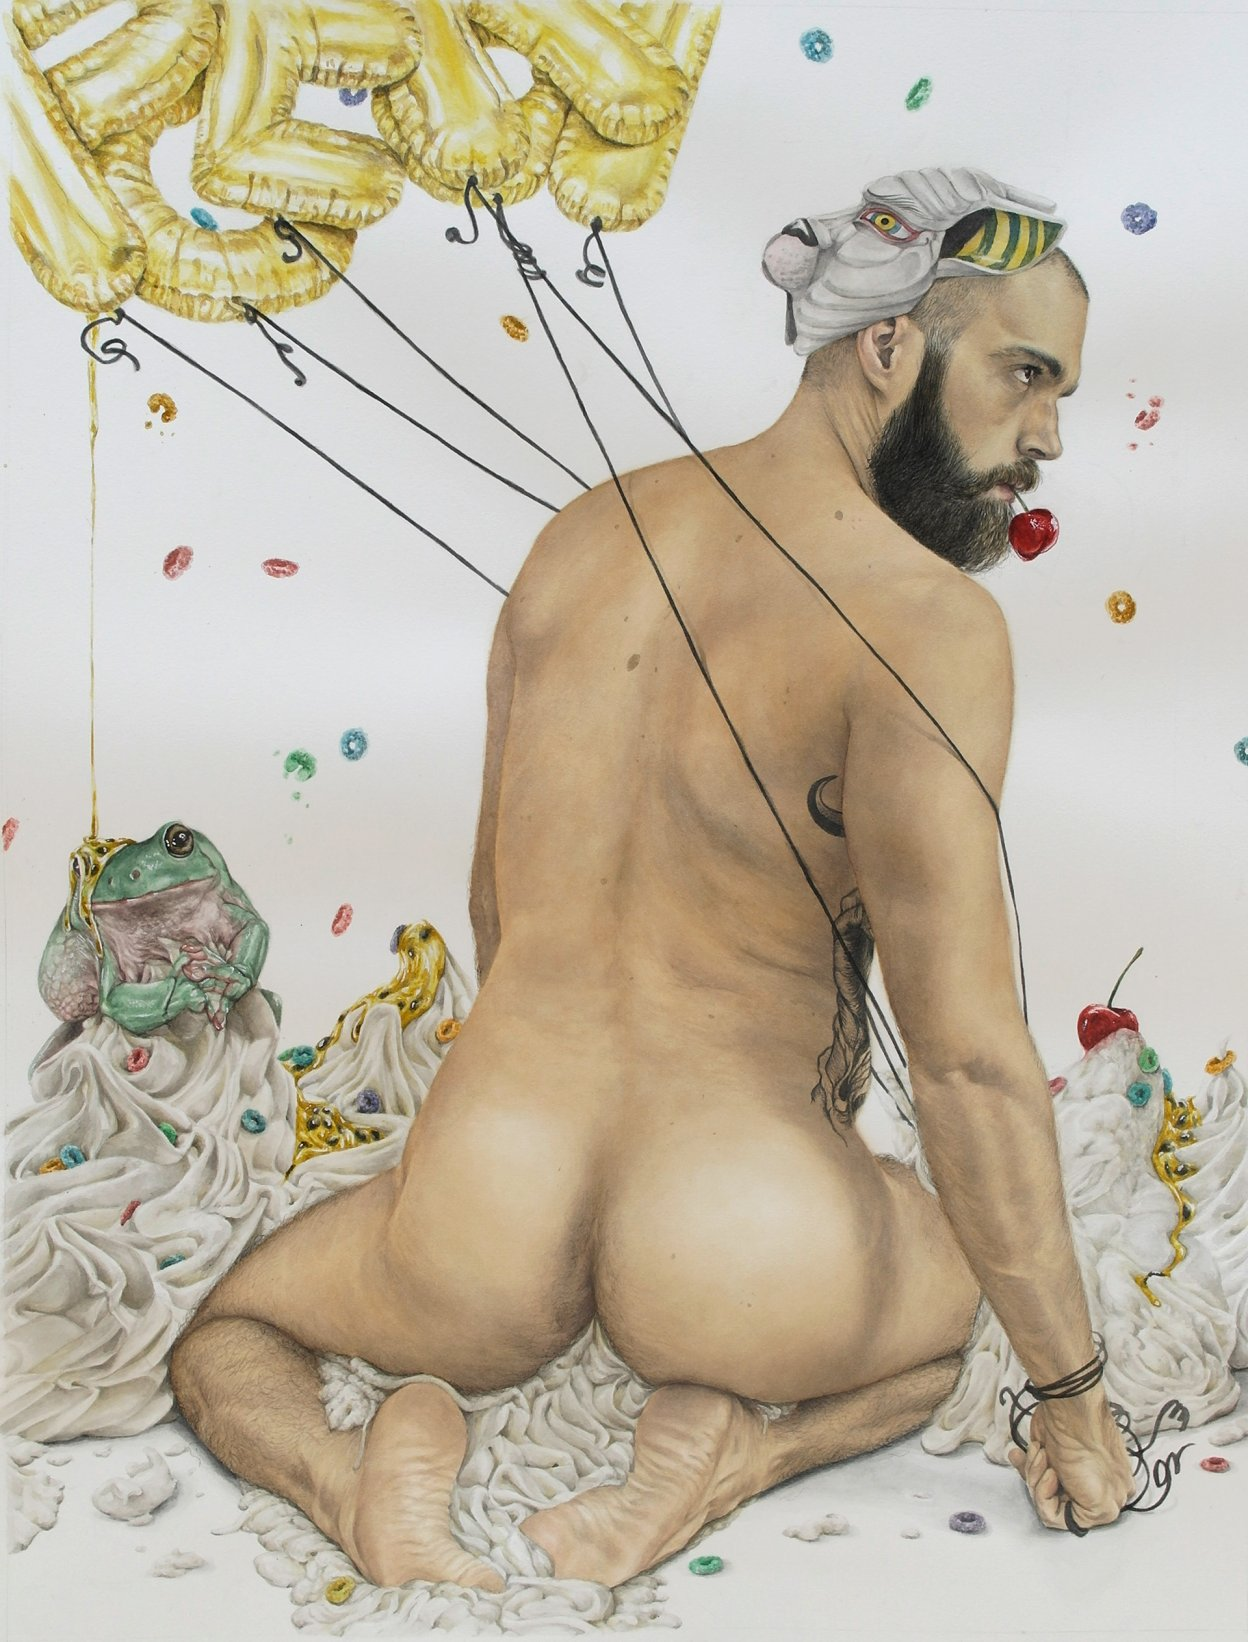 Sintitulo (2018) - Luis Felipe Camargo